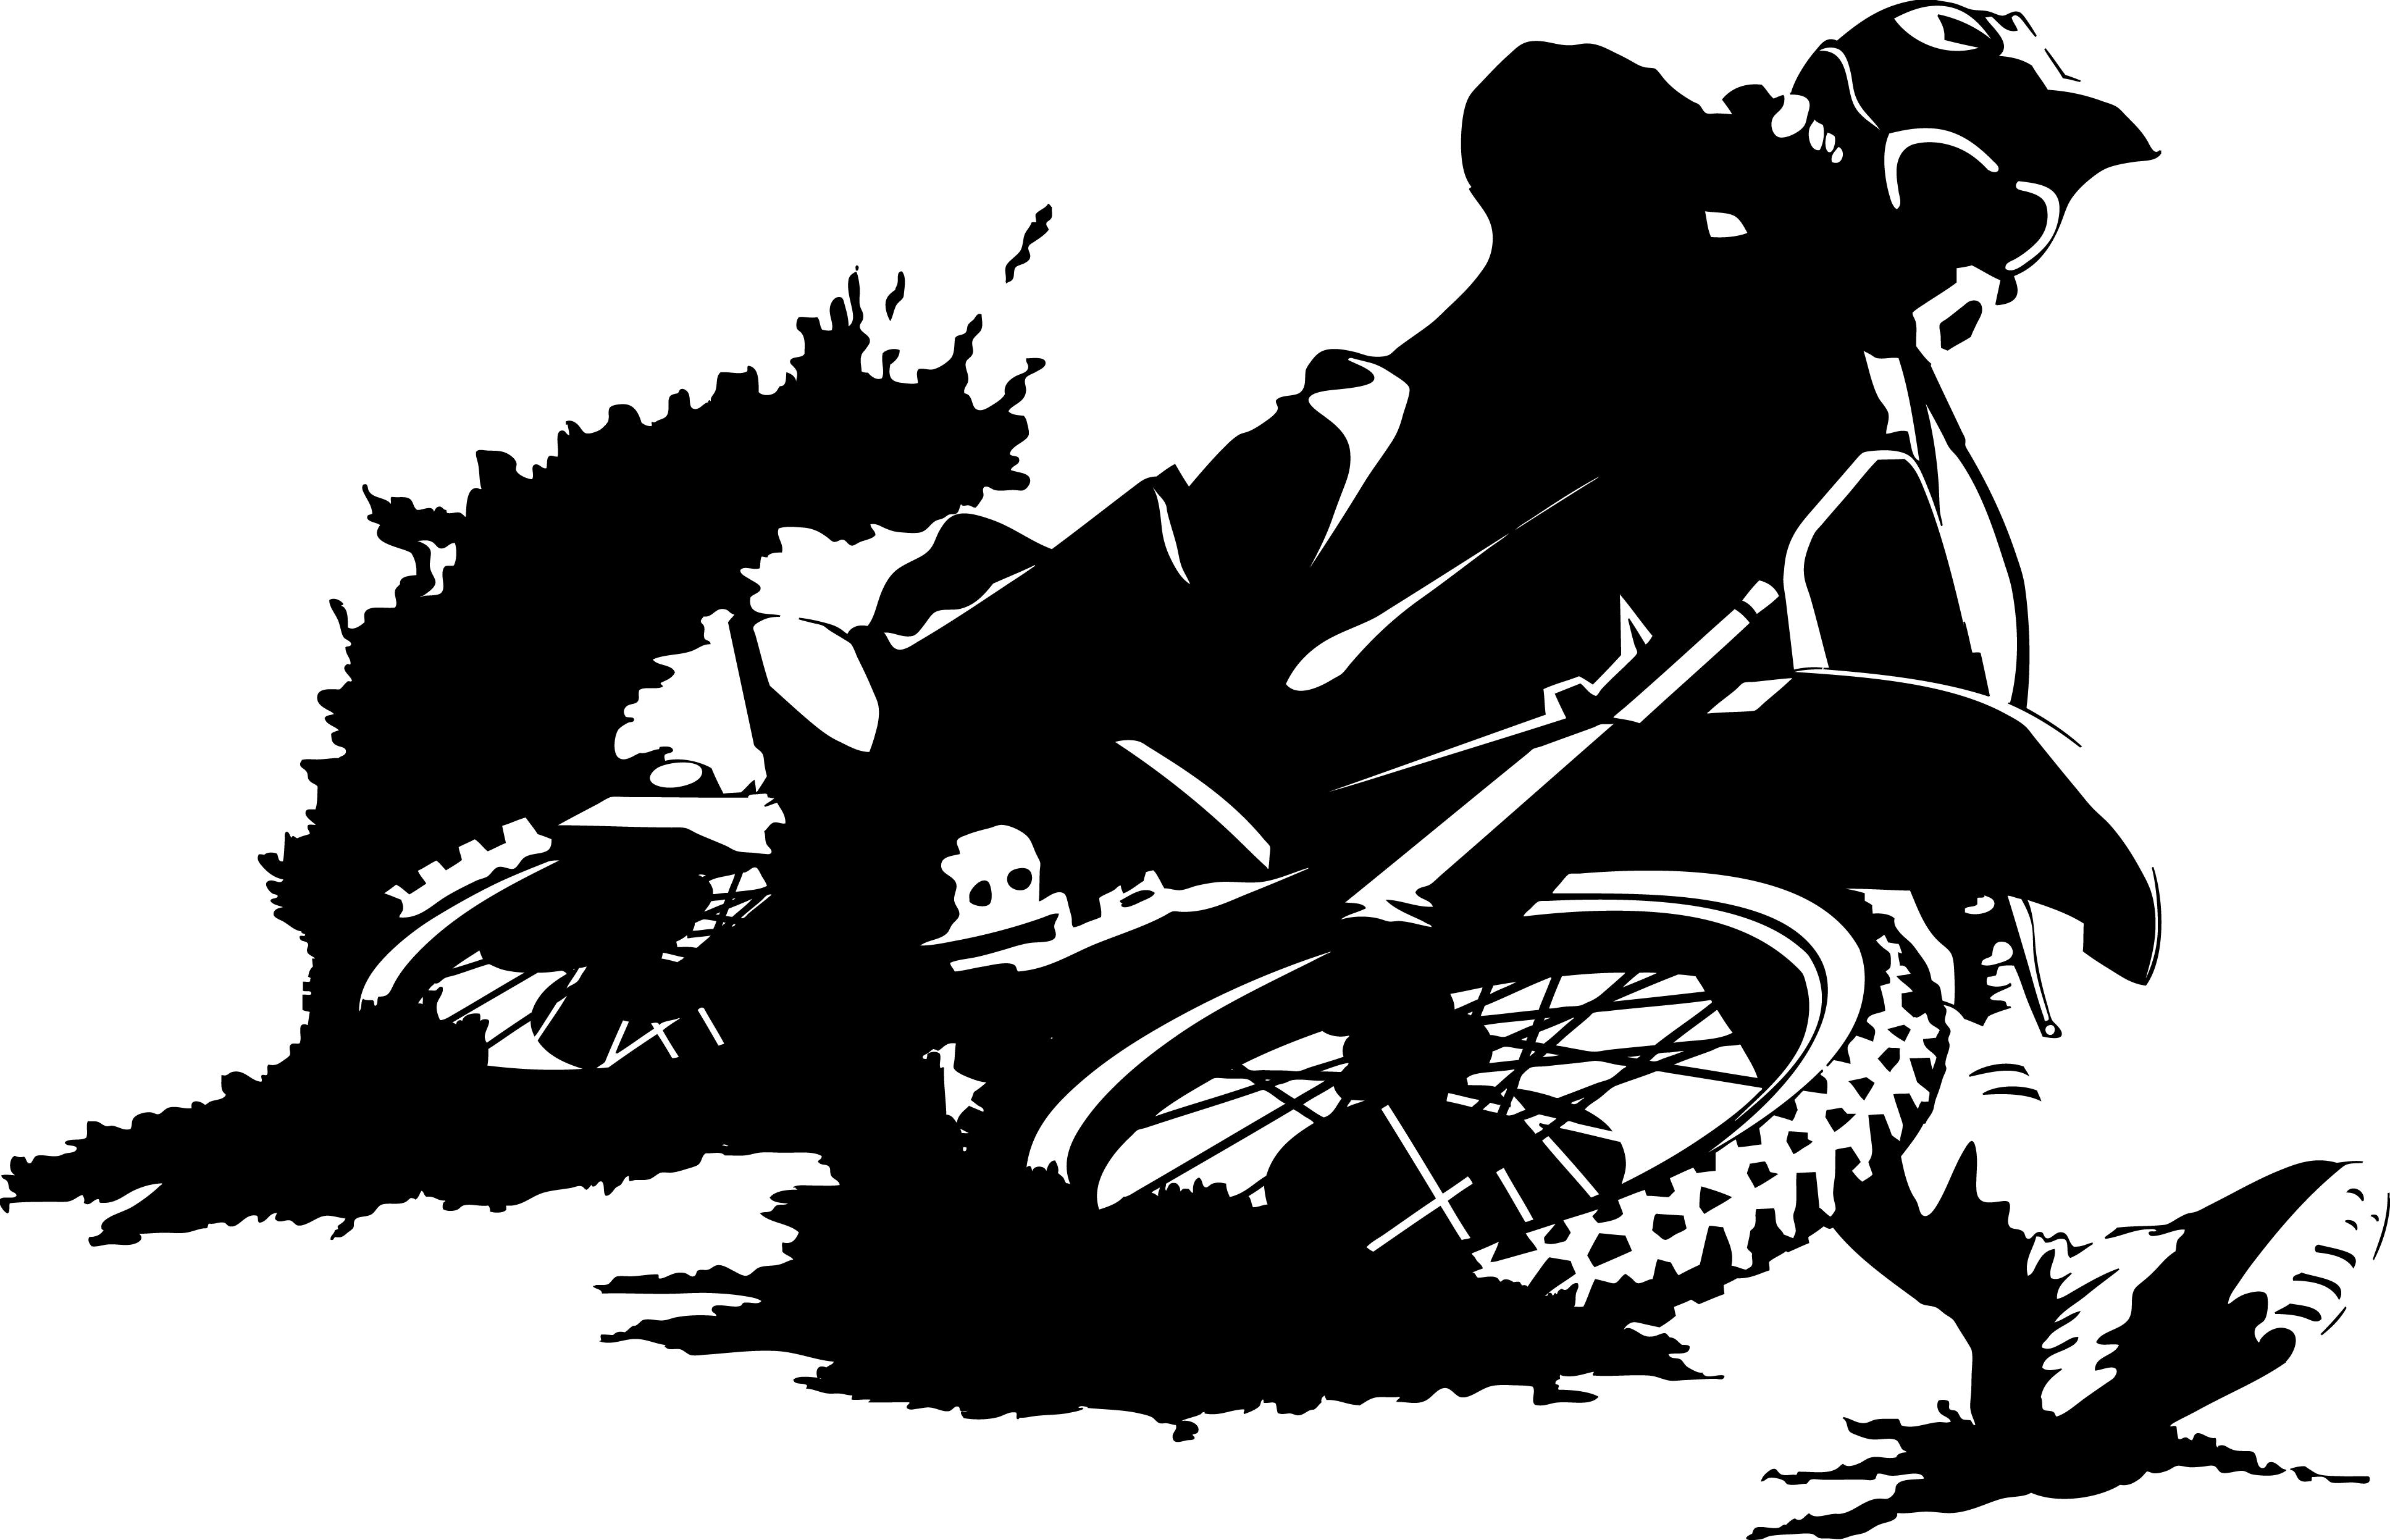 Motocross Dirt Bike Clipart - Clipart Suggest